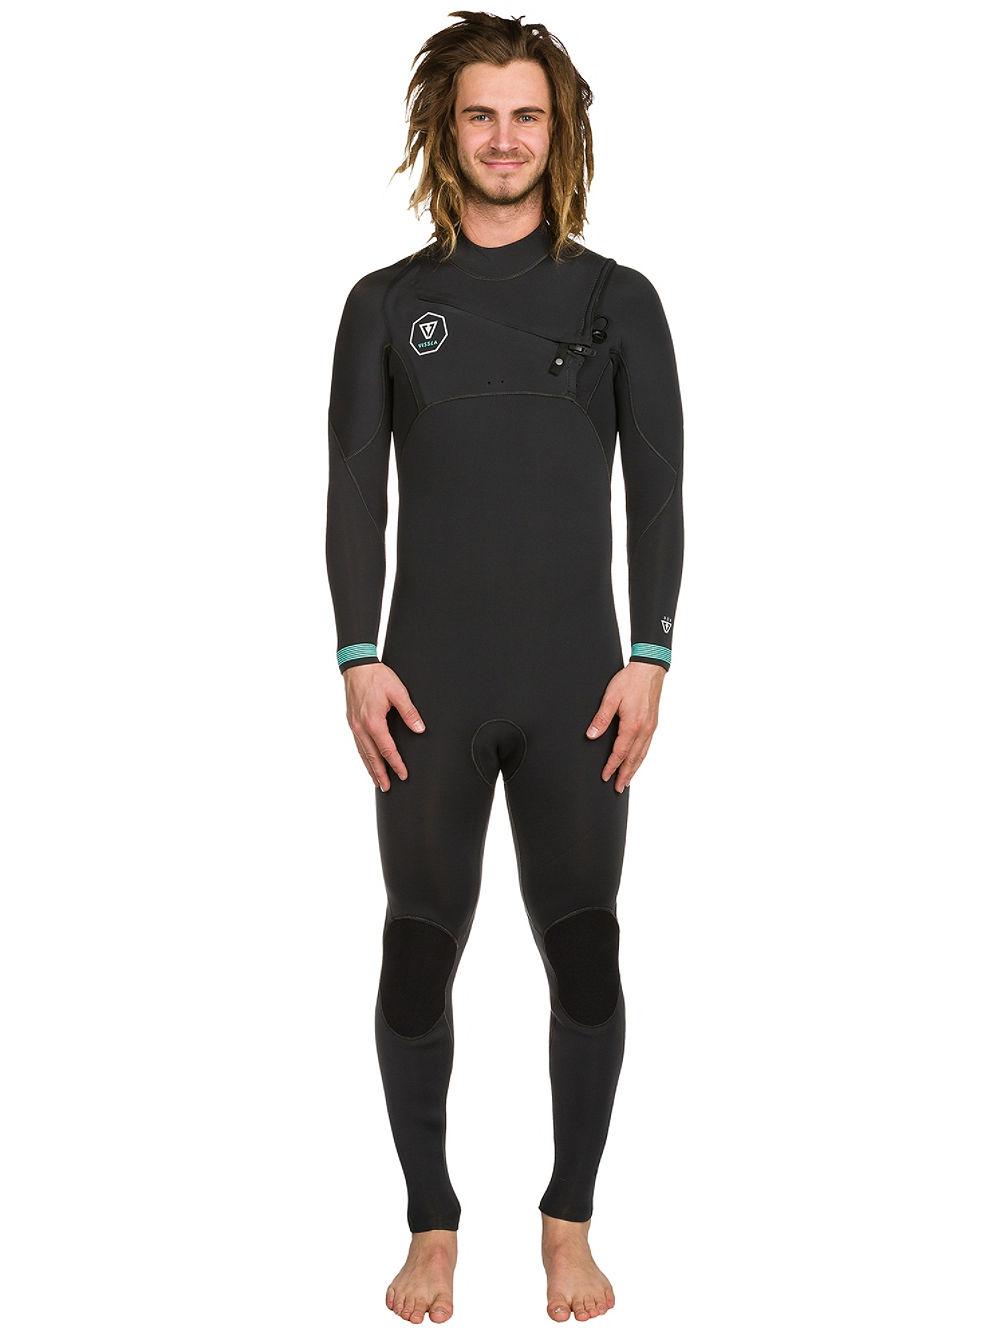 vissla-seven-seas-43-full-chest-zip-wetsuit